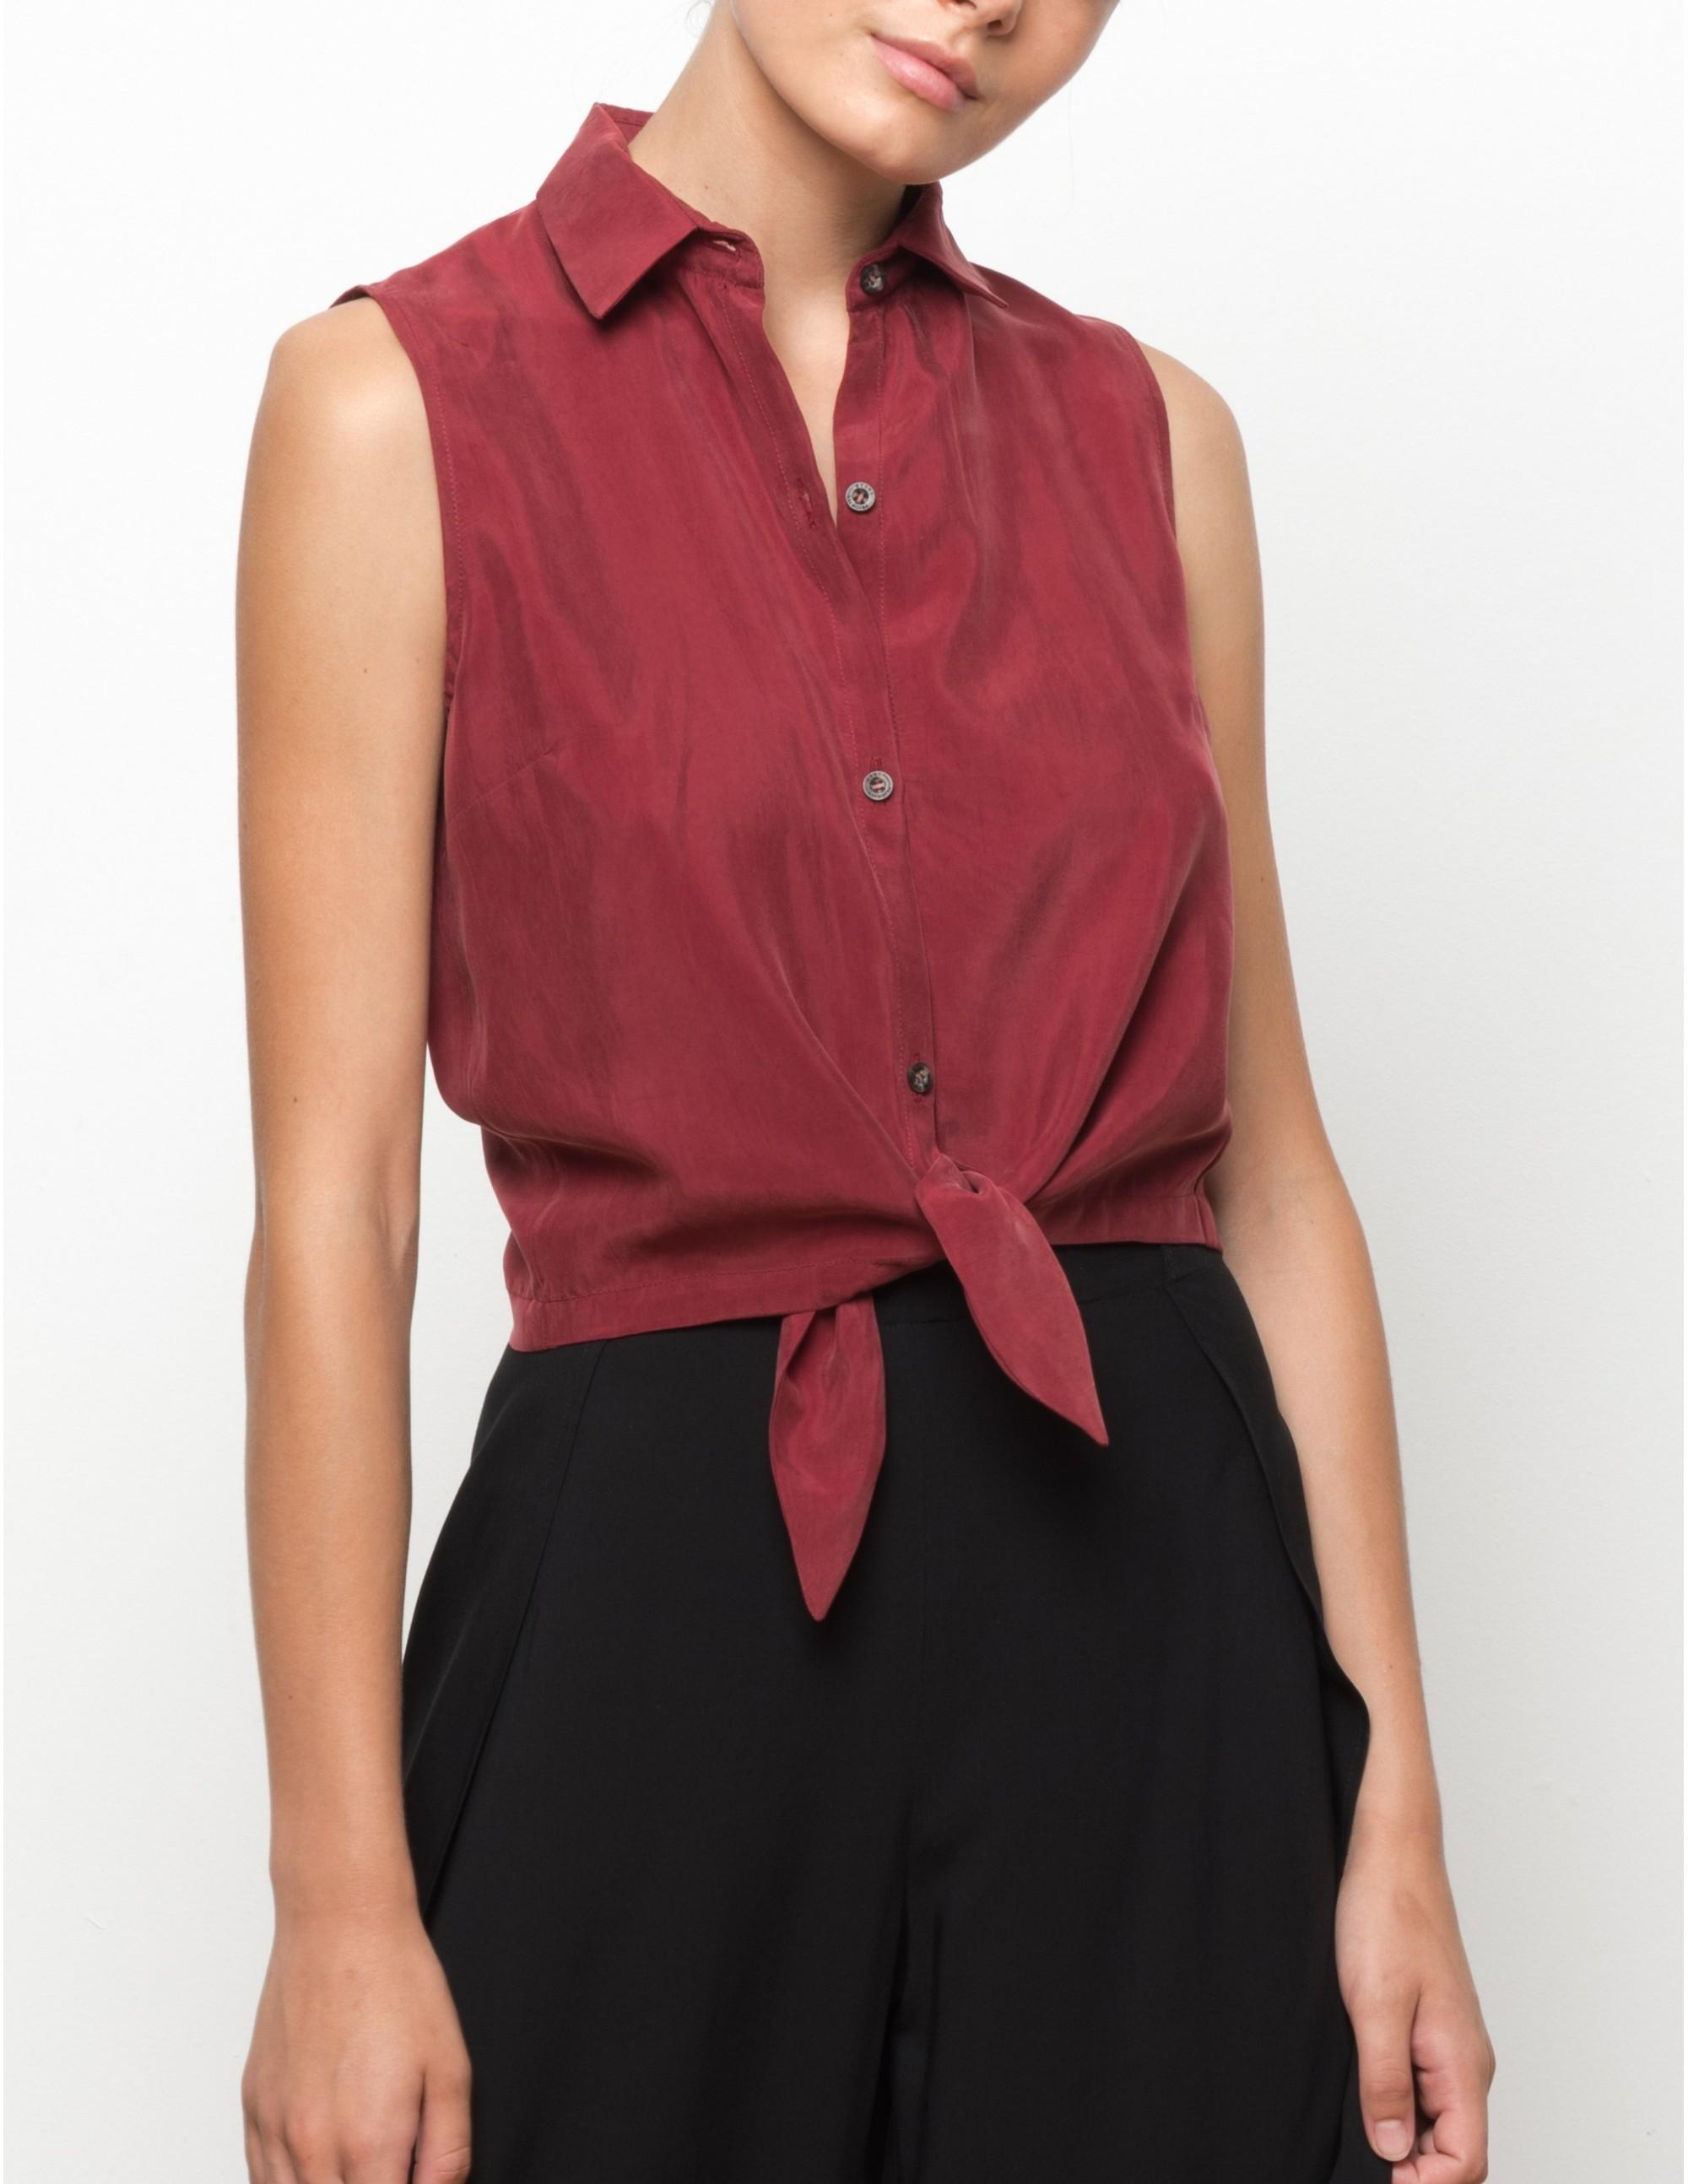 MISALI camisa - MASAAI